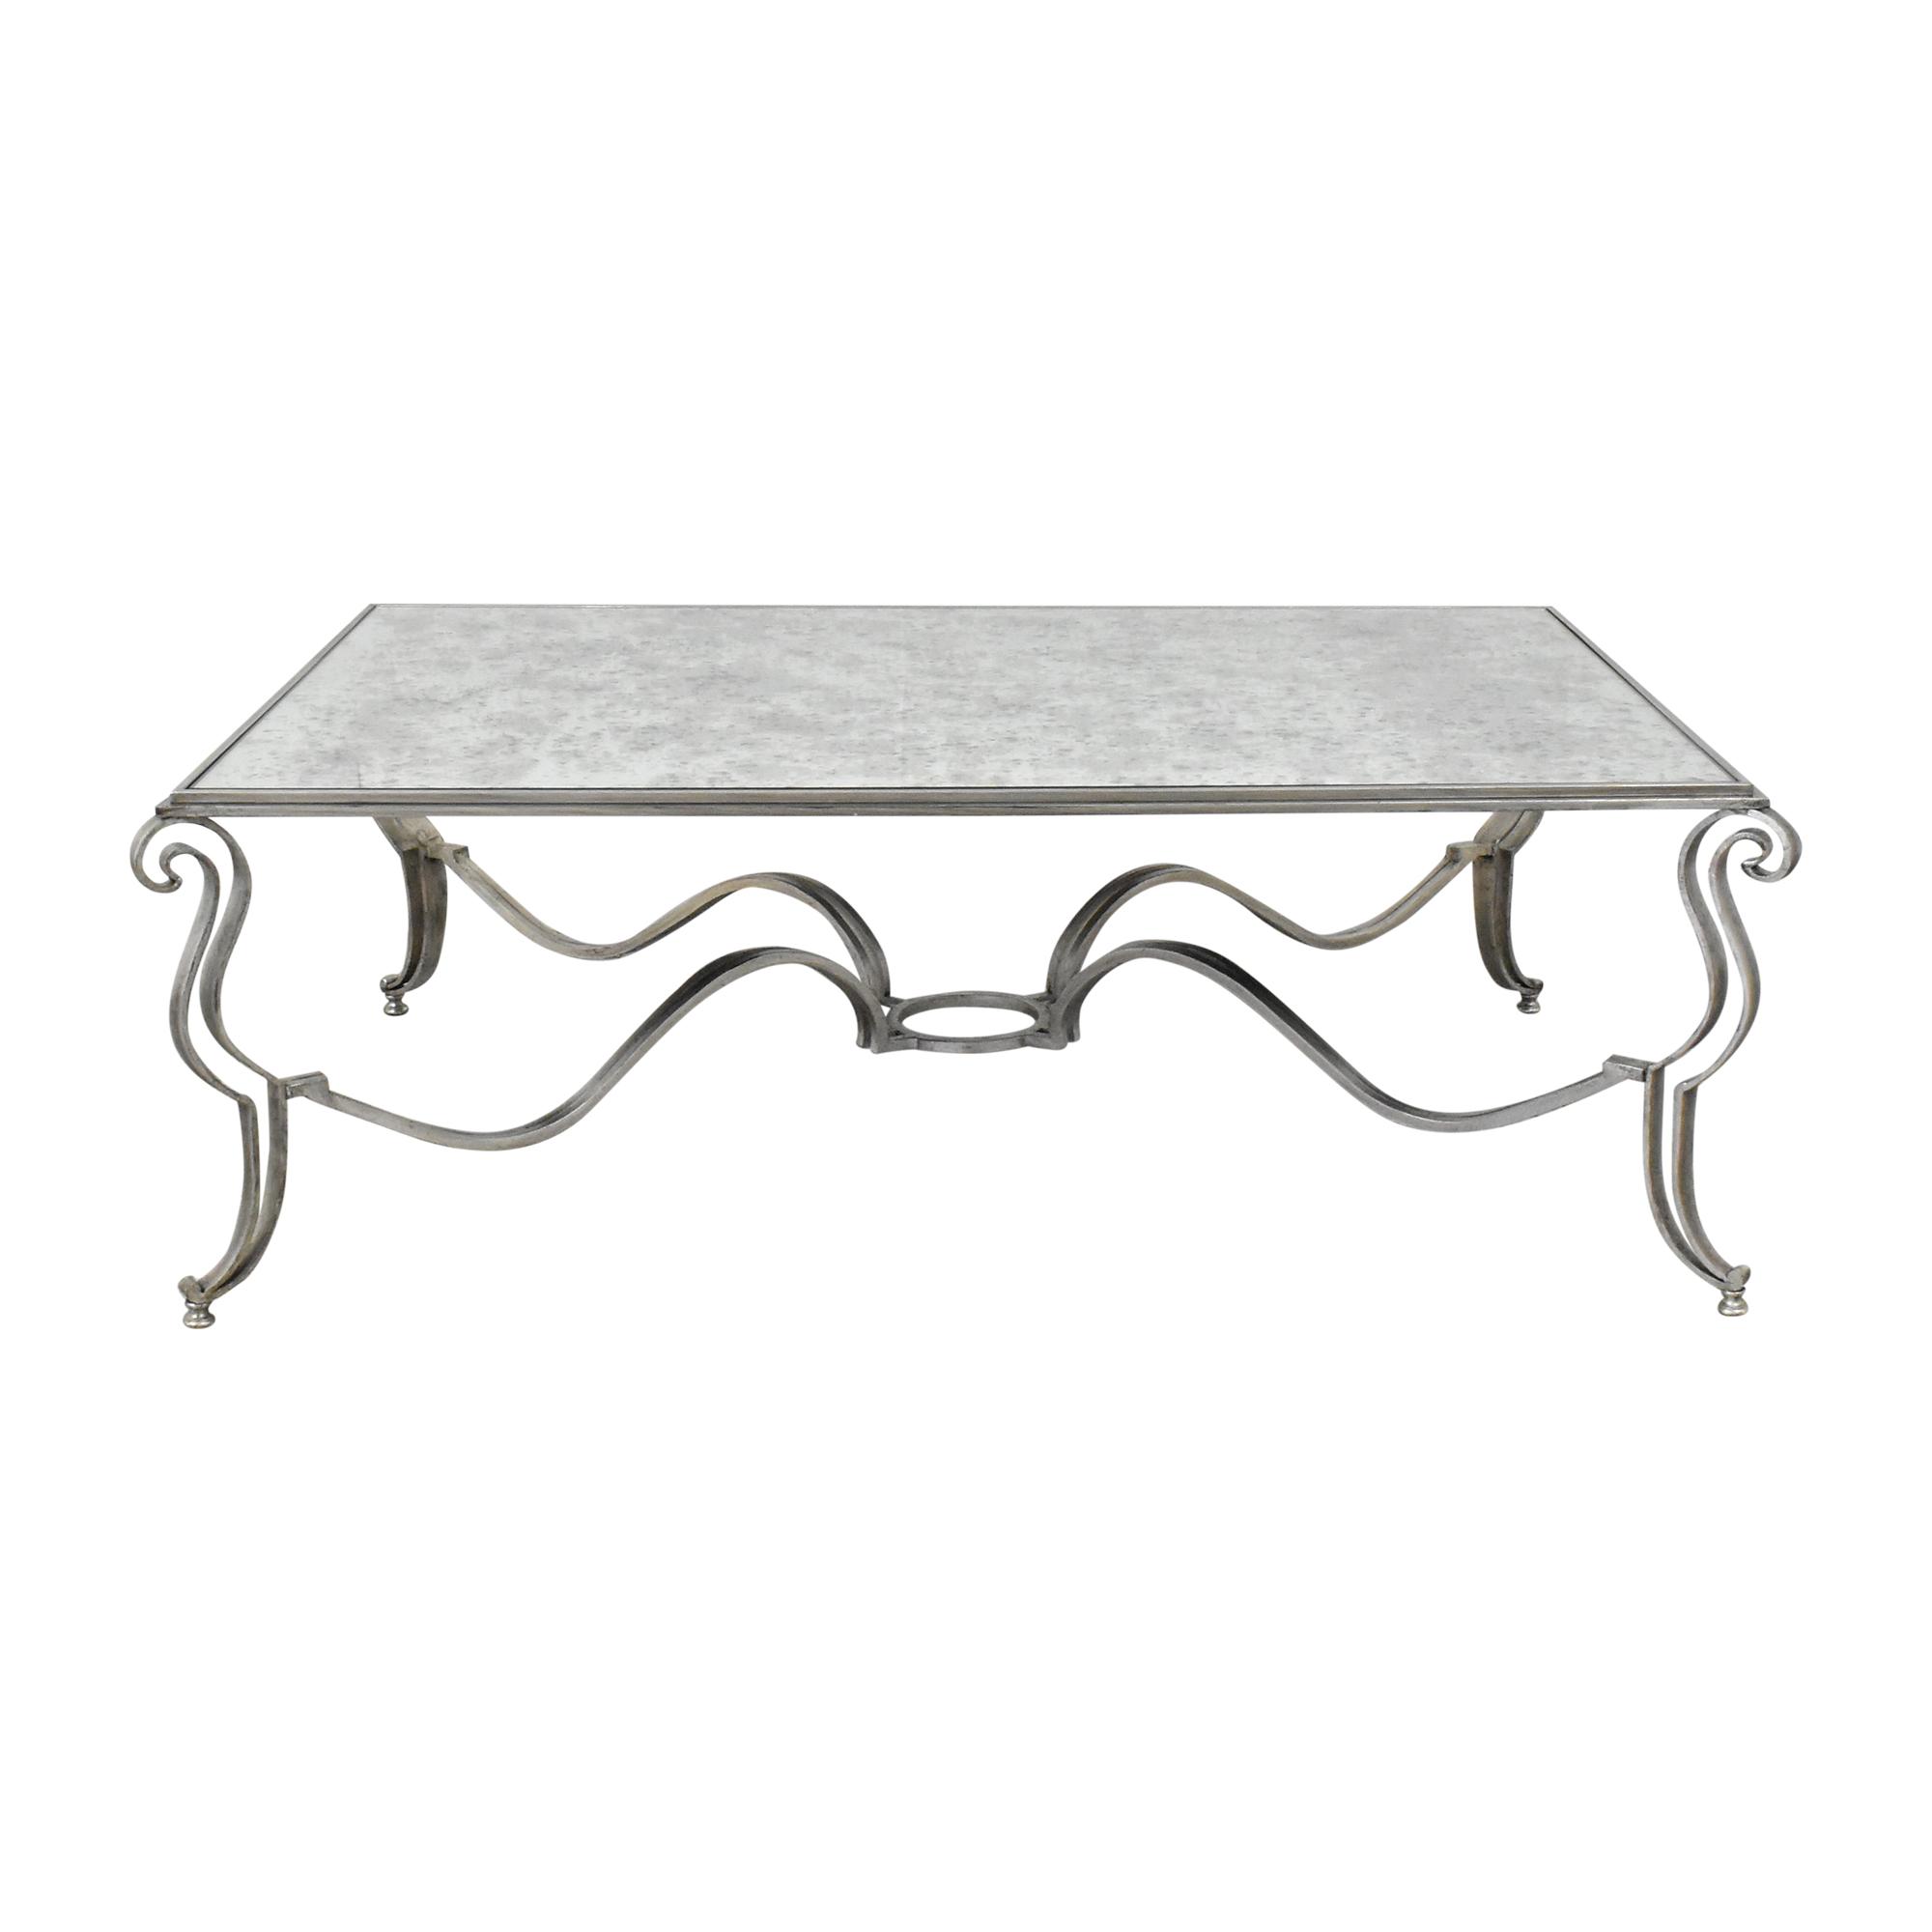 Custom Mirrored Coffee Table nj